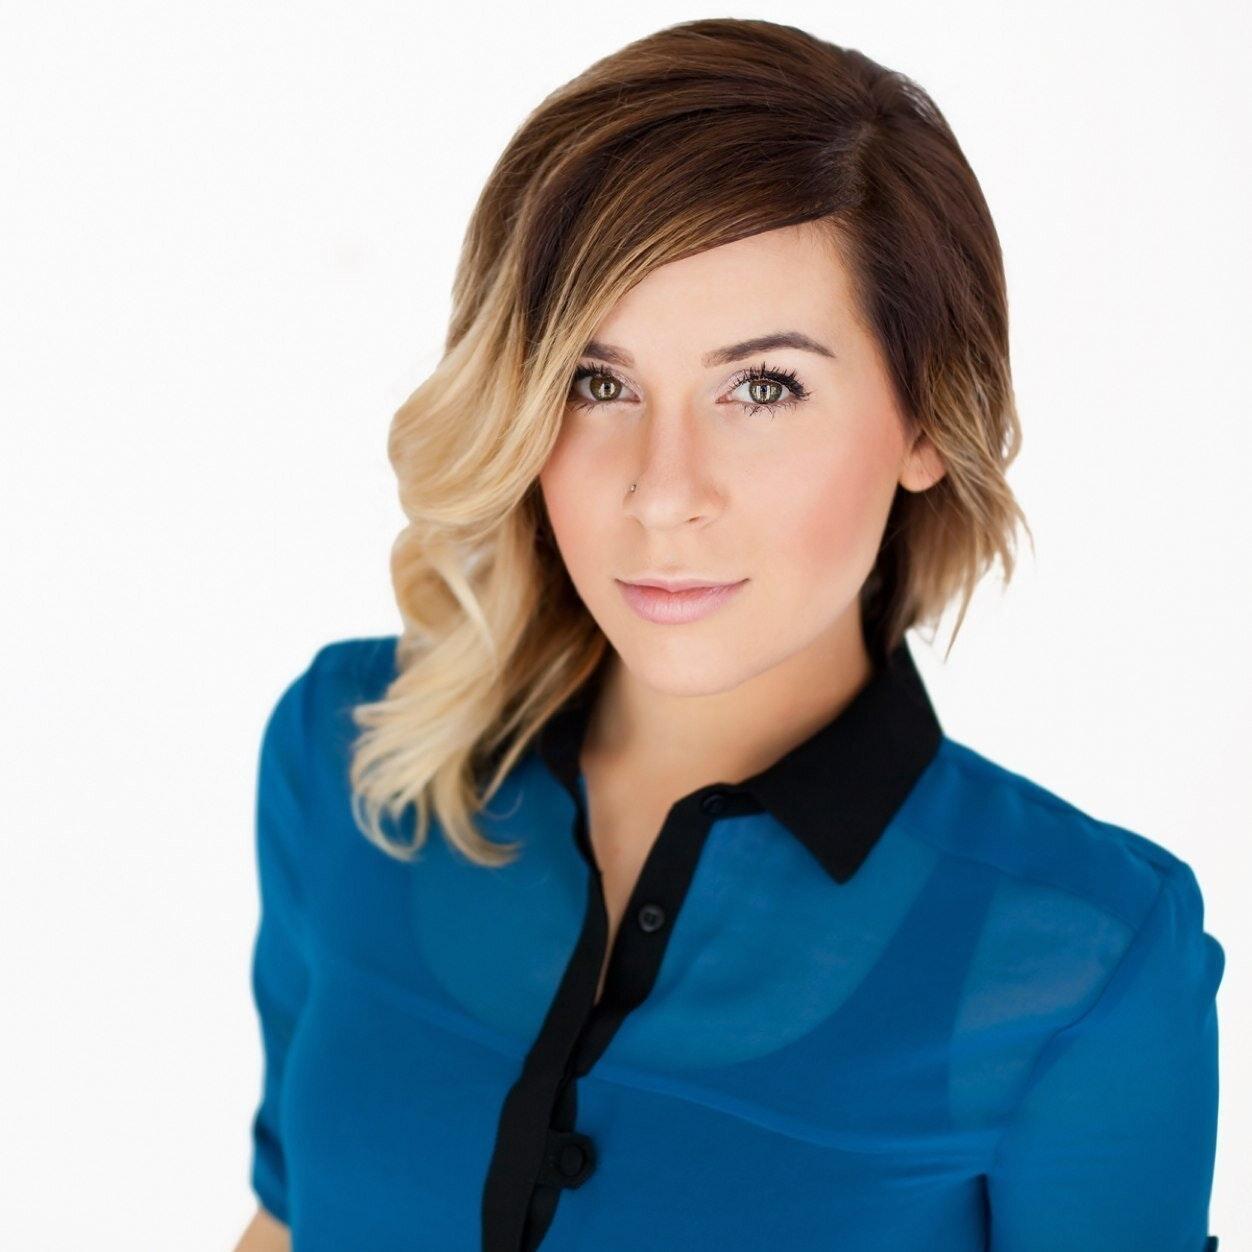 Sara Rose McKenna